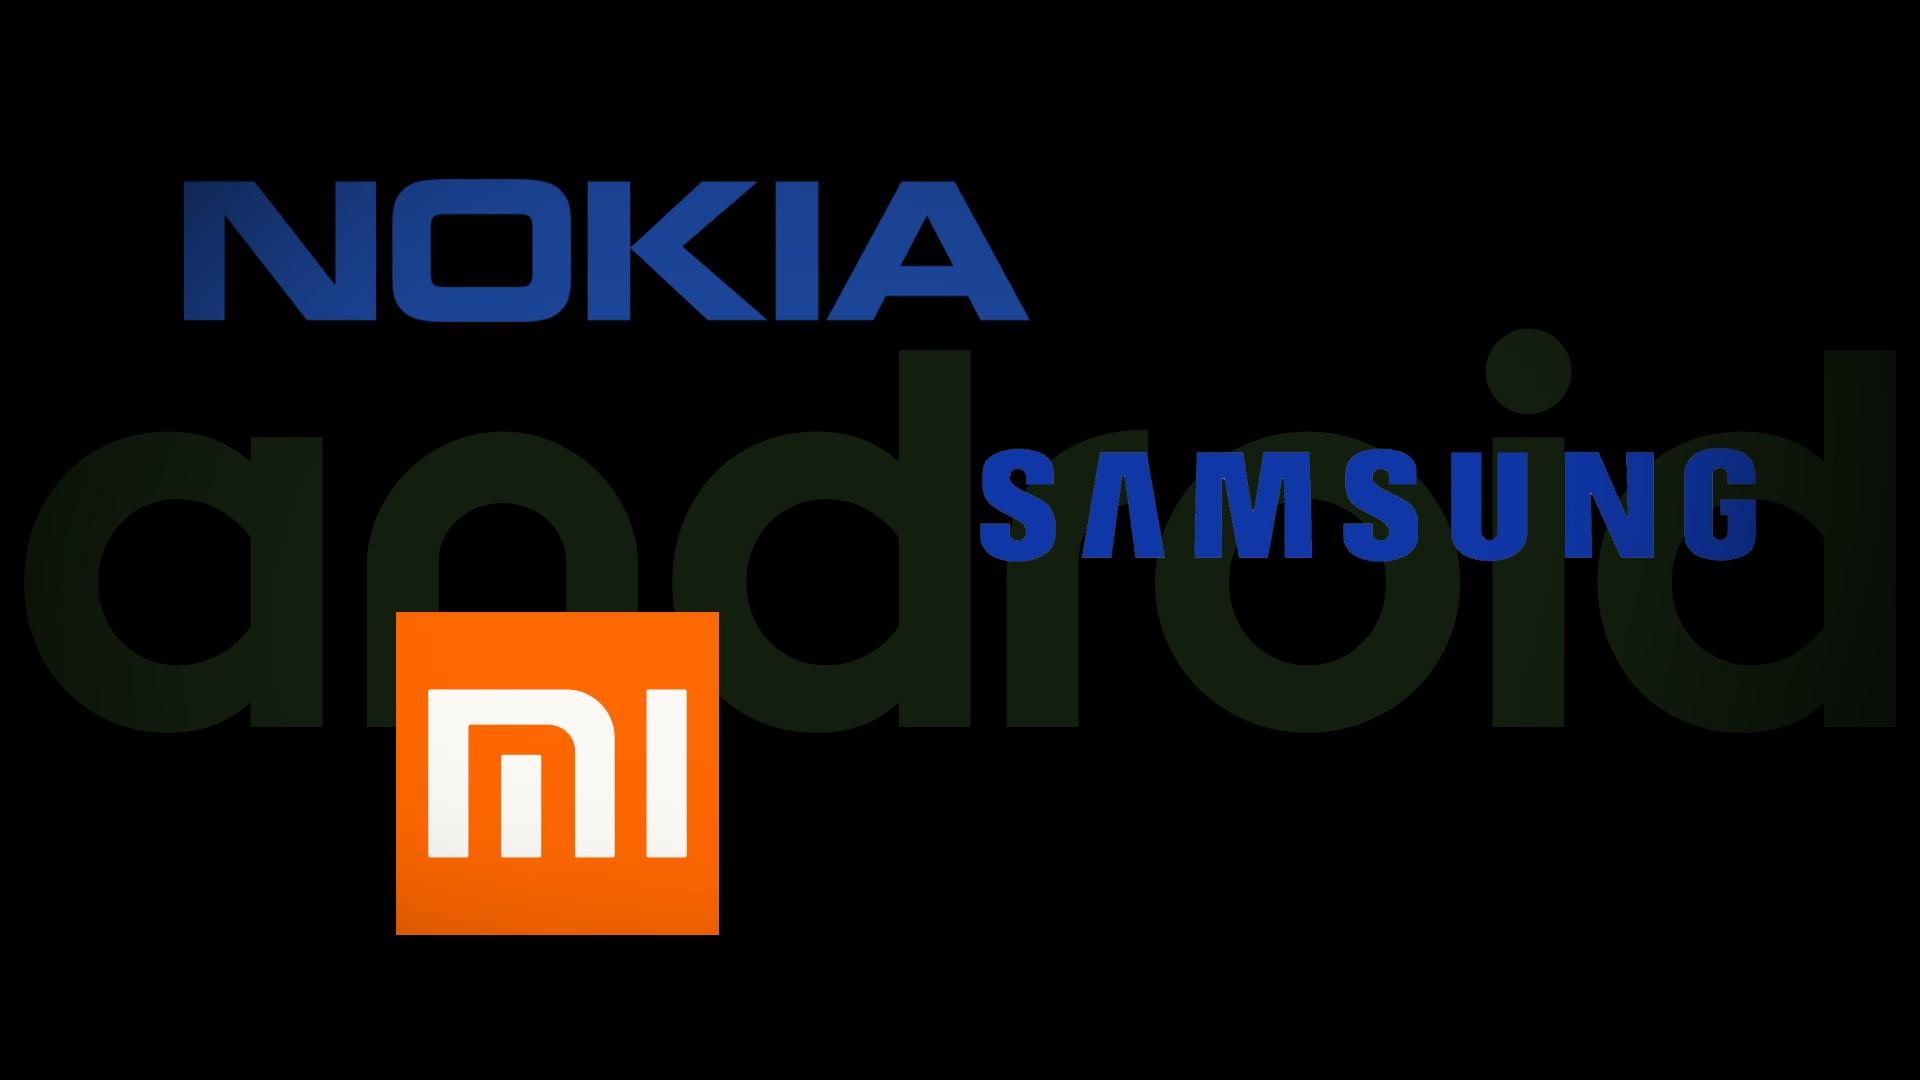 Samsung Nokia Xiaomi Android